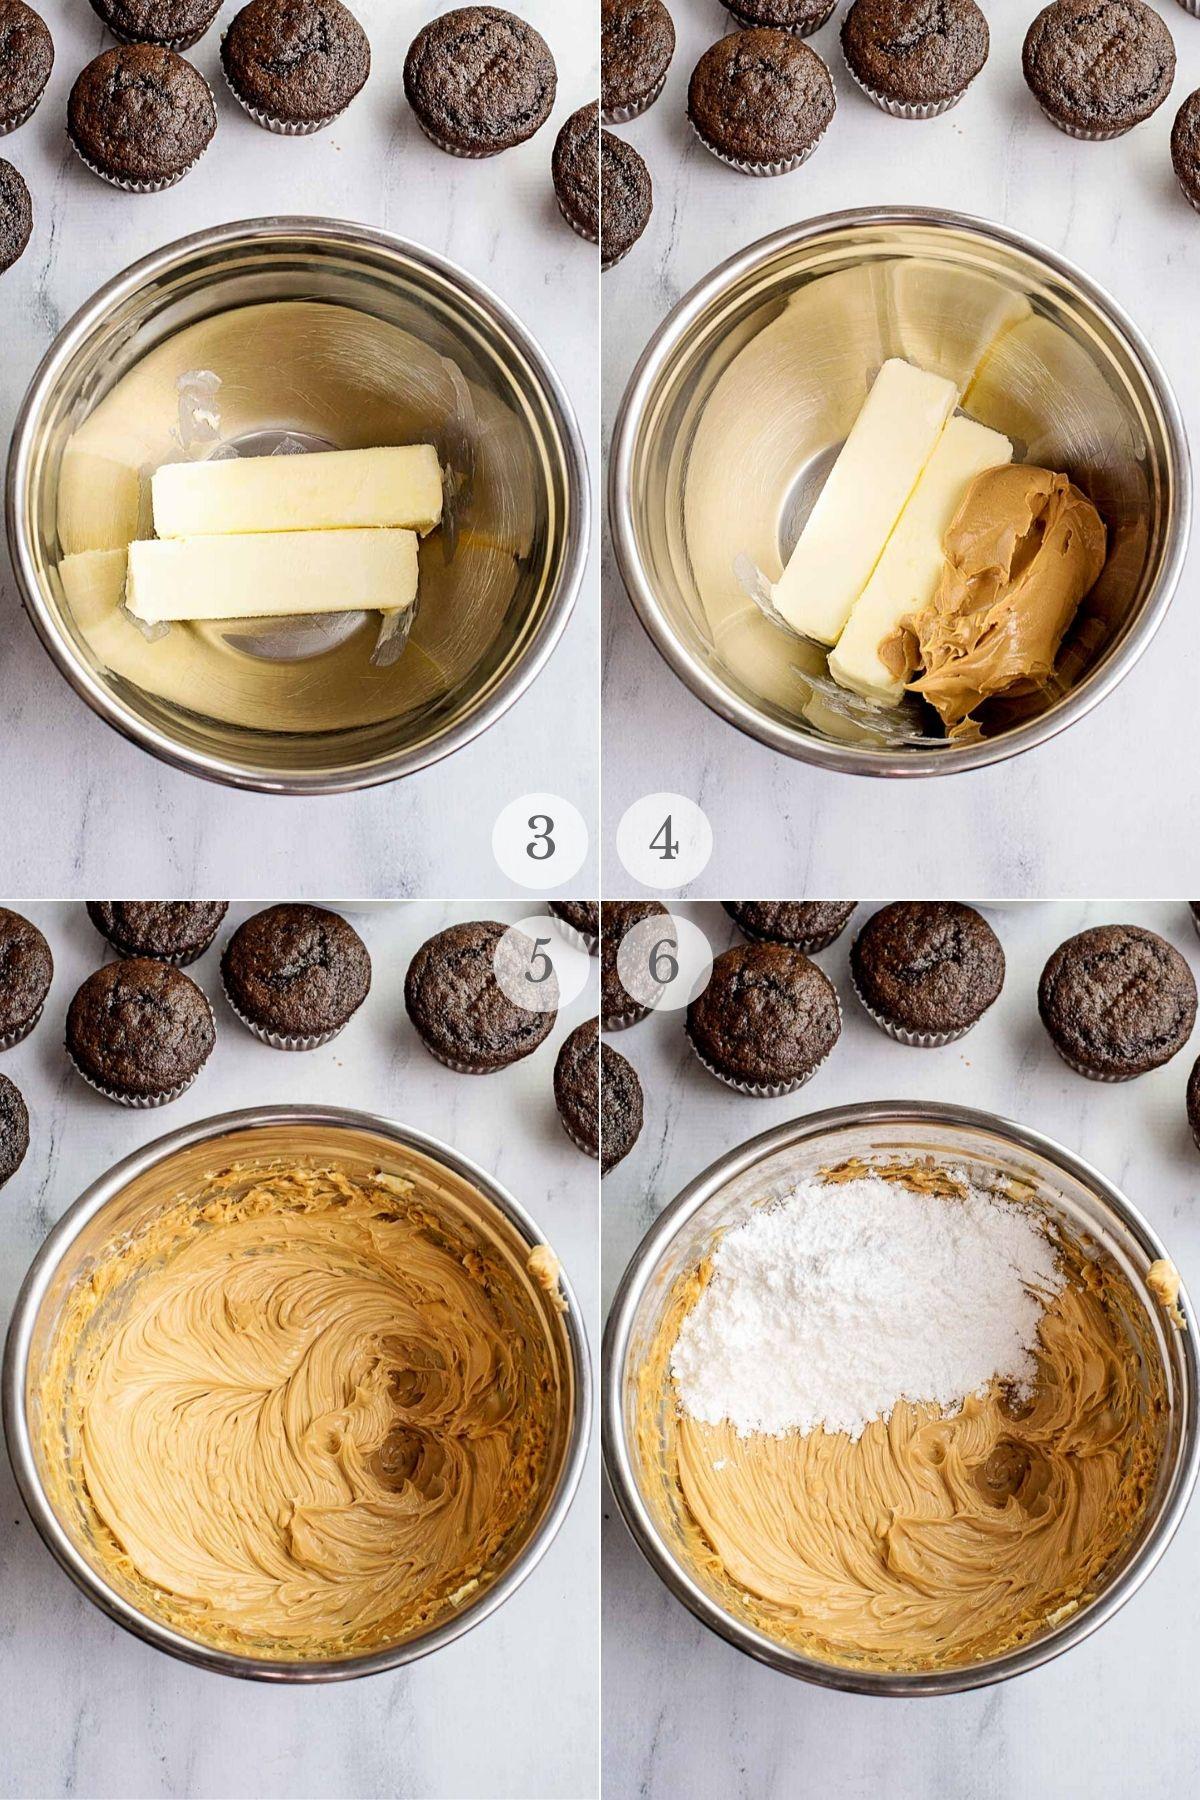 peanut butter frosting recipe steps 1-4